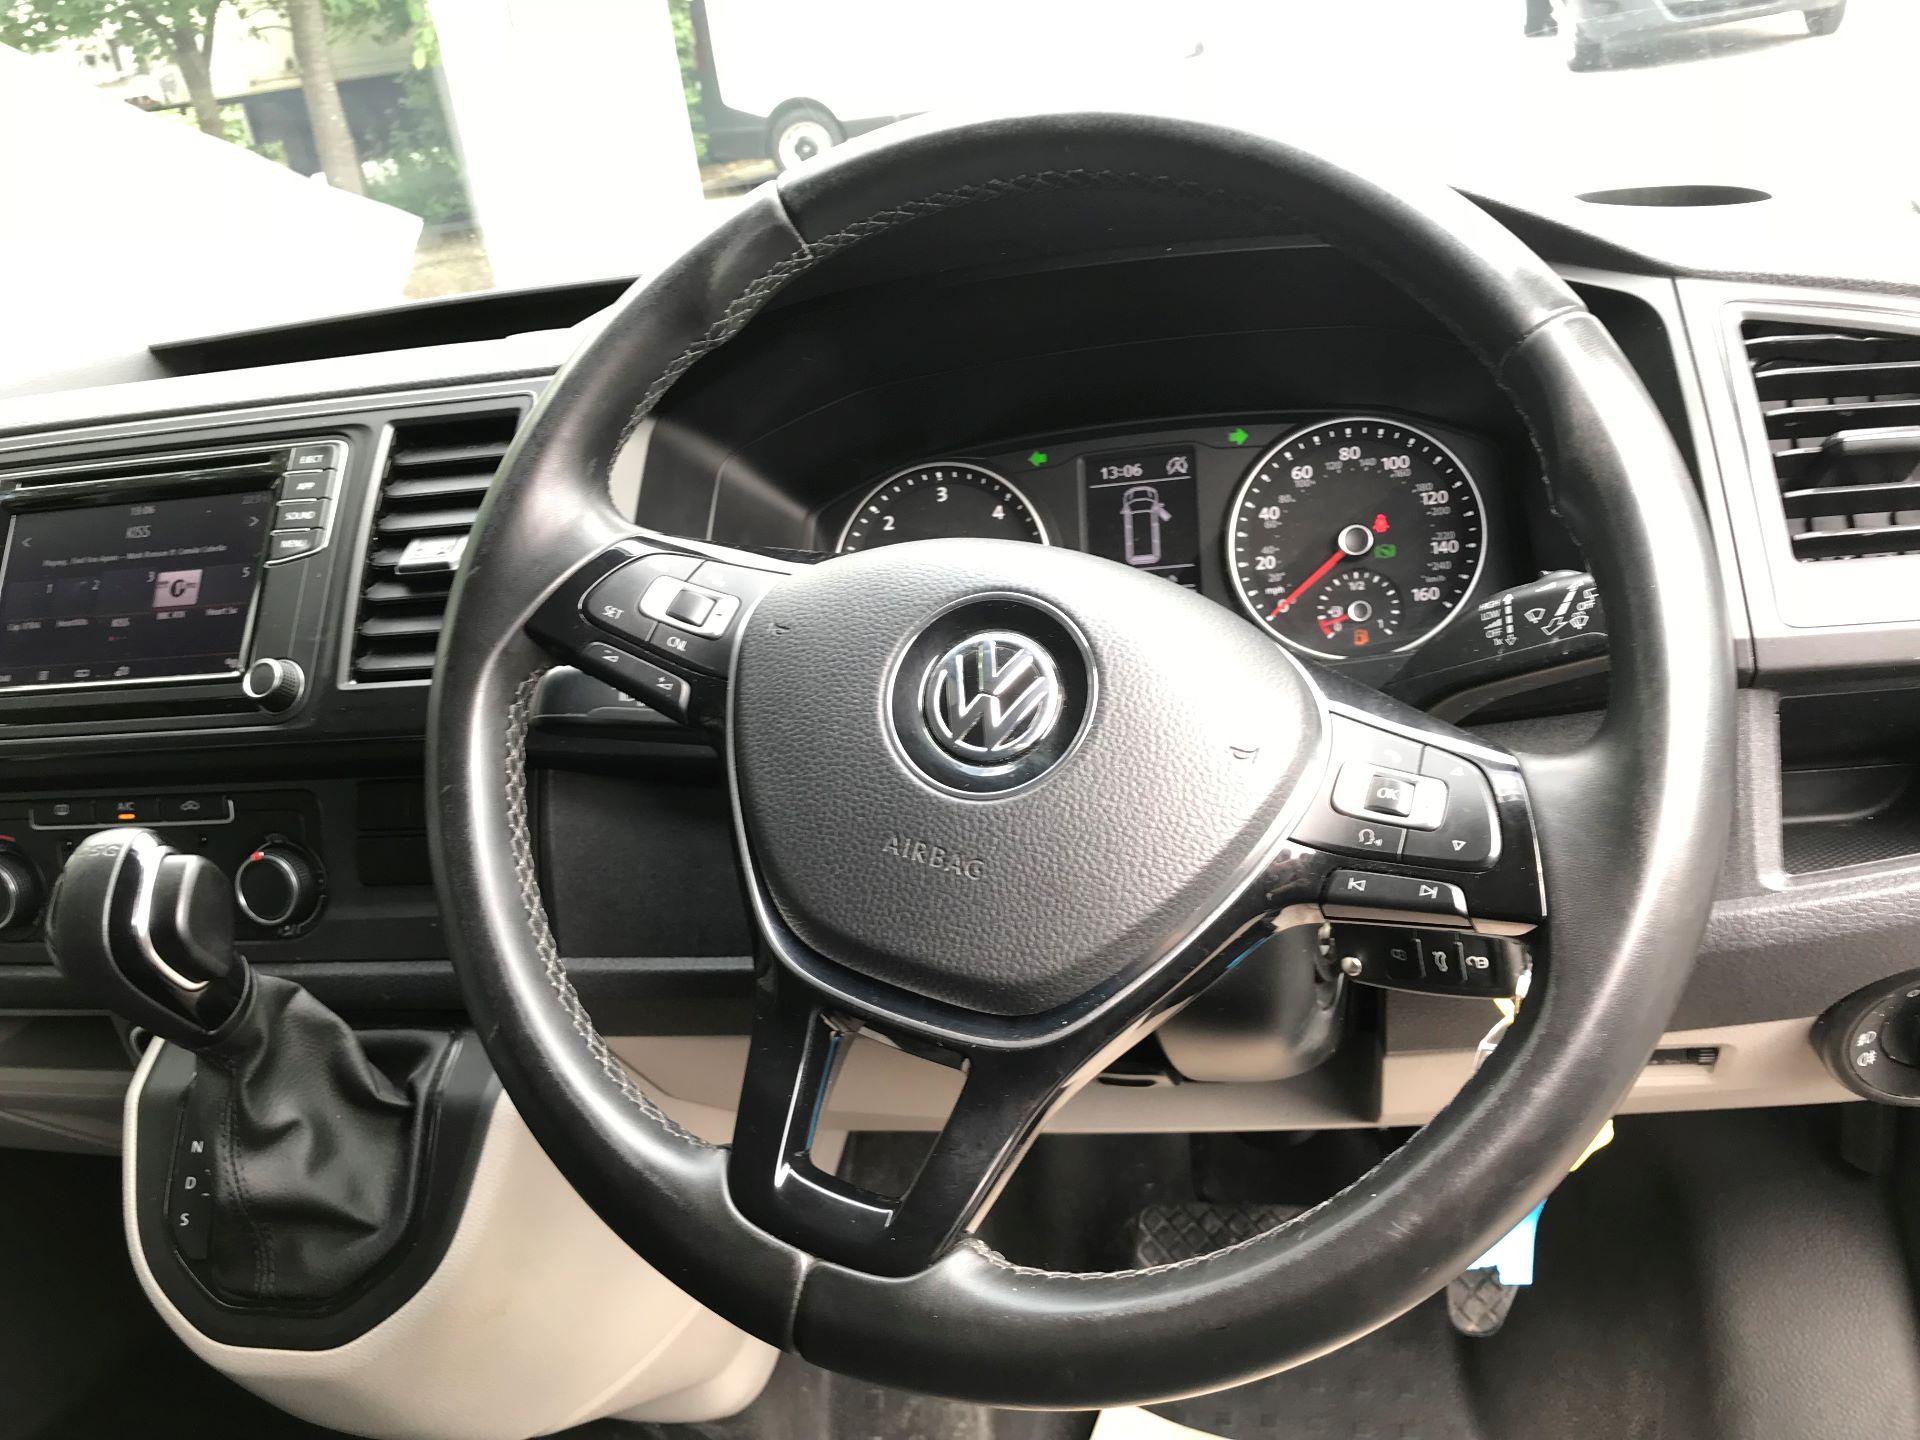 2018 Volkswagen Transporter 2.0 Tdi Bmt 150 Highline Kombi Van Dsg euro 6 (GU18FHR) Image 6